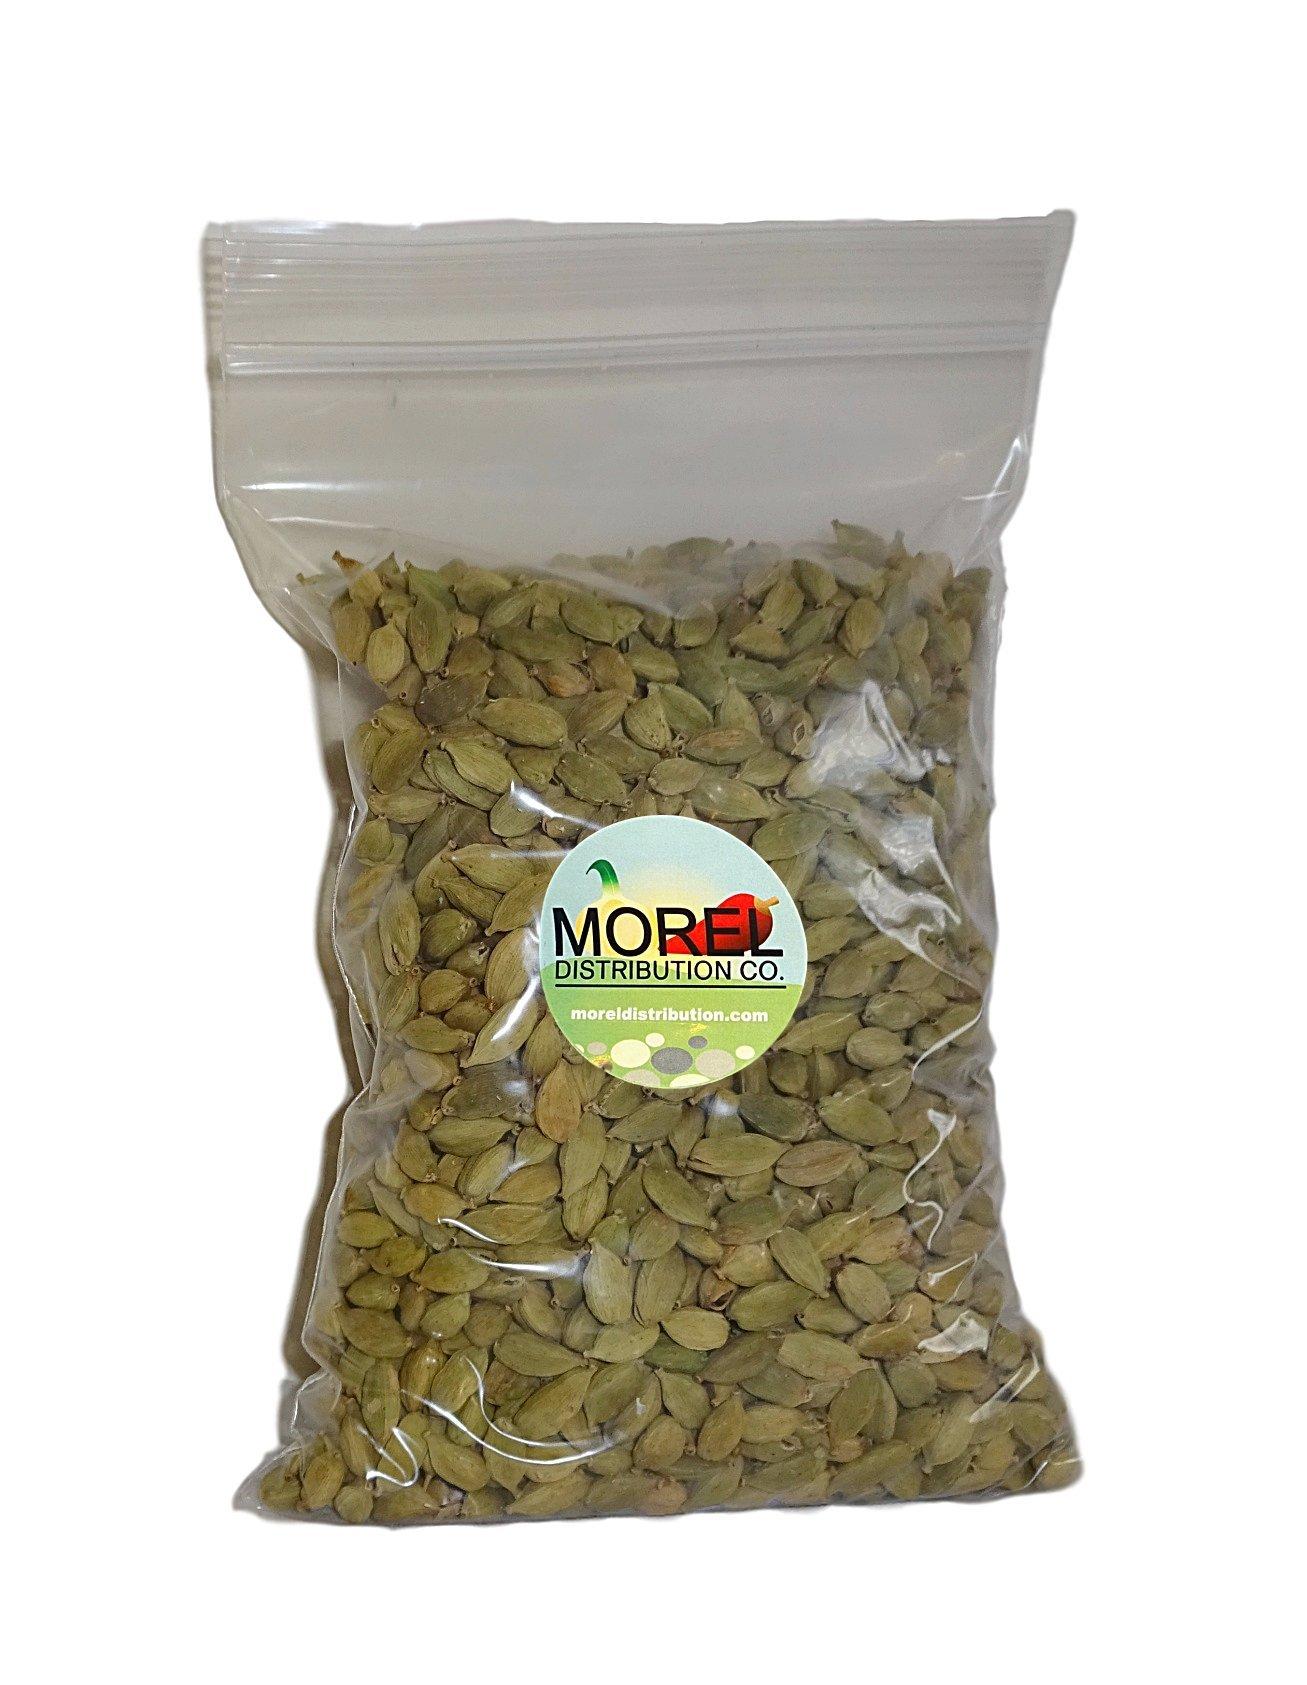 Whole Cardamom Pods/Seeds (Cardamomo) (1 oz, 2 oz, 4 oz, 6 oz, 8 oz, 12 oz, 1 lb, 2 lbs) (12 OZ) by Morel Distribution Company (Image #2)